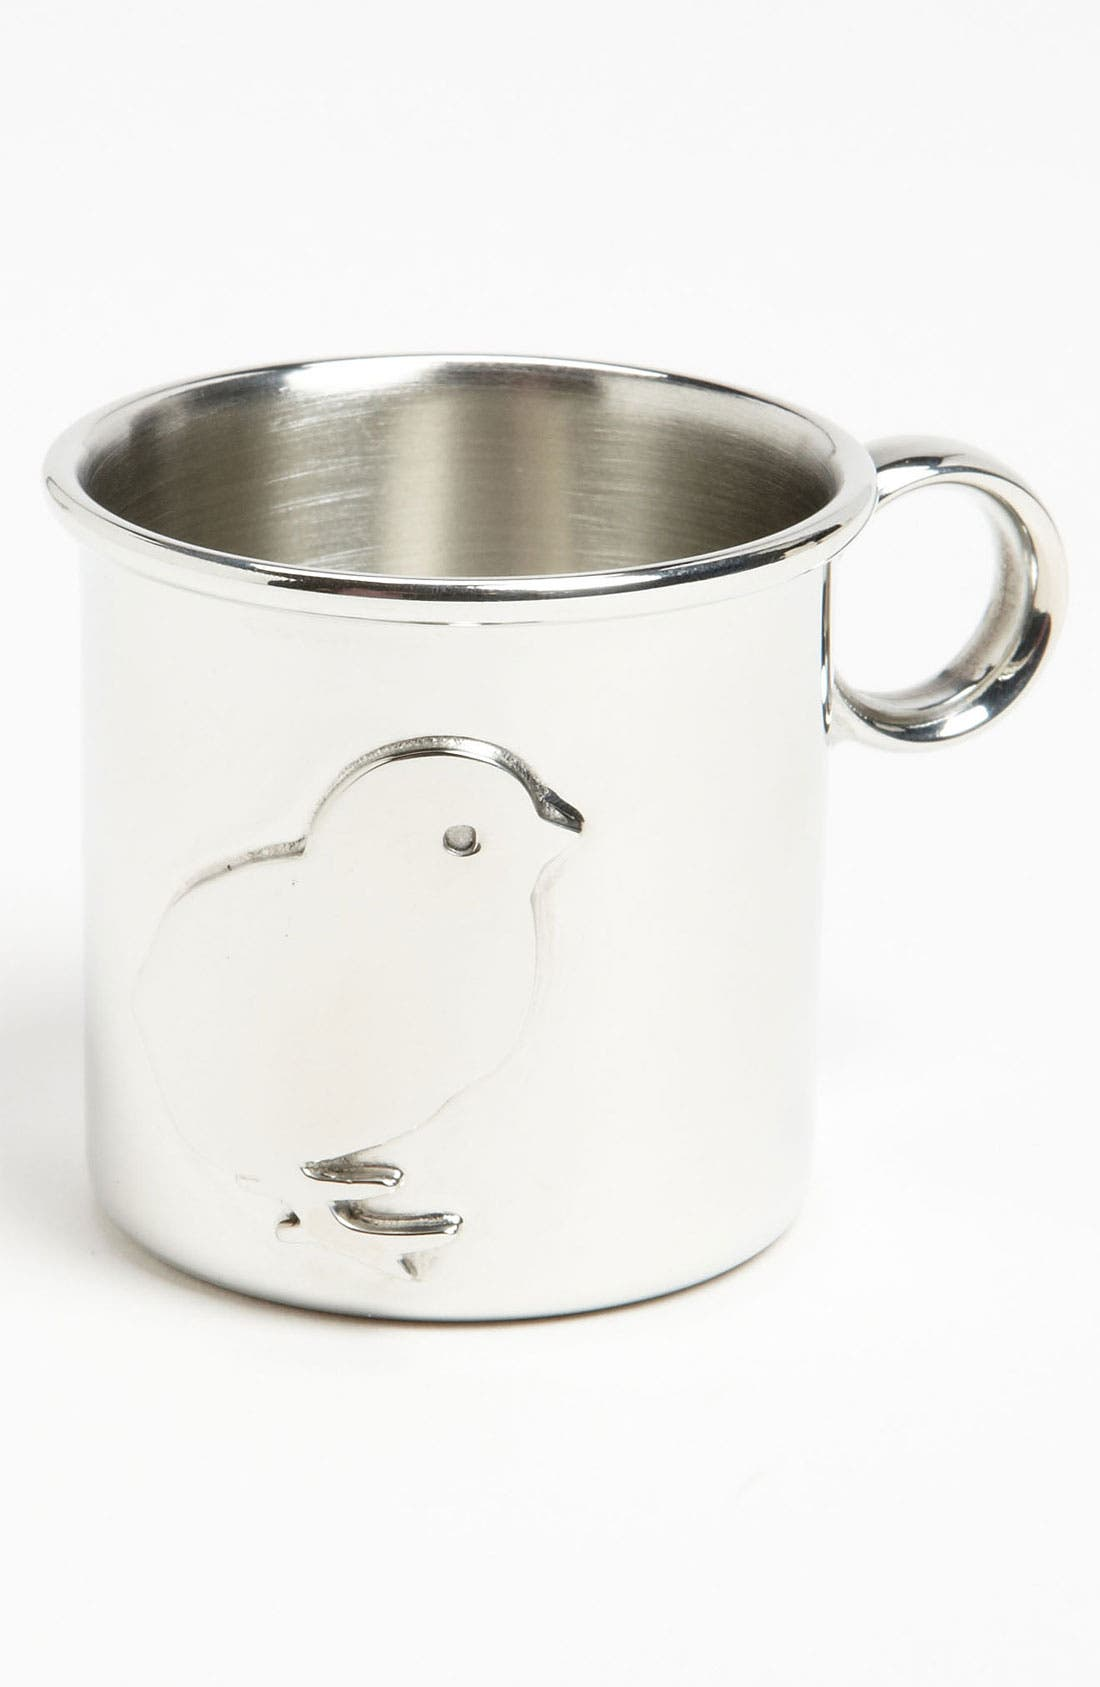 Alternate Image 1 Selected - Beehive Kitchenware 'Chick' Keepsake Cup